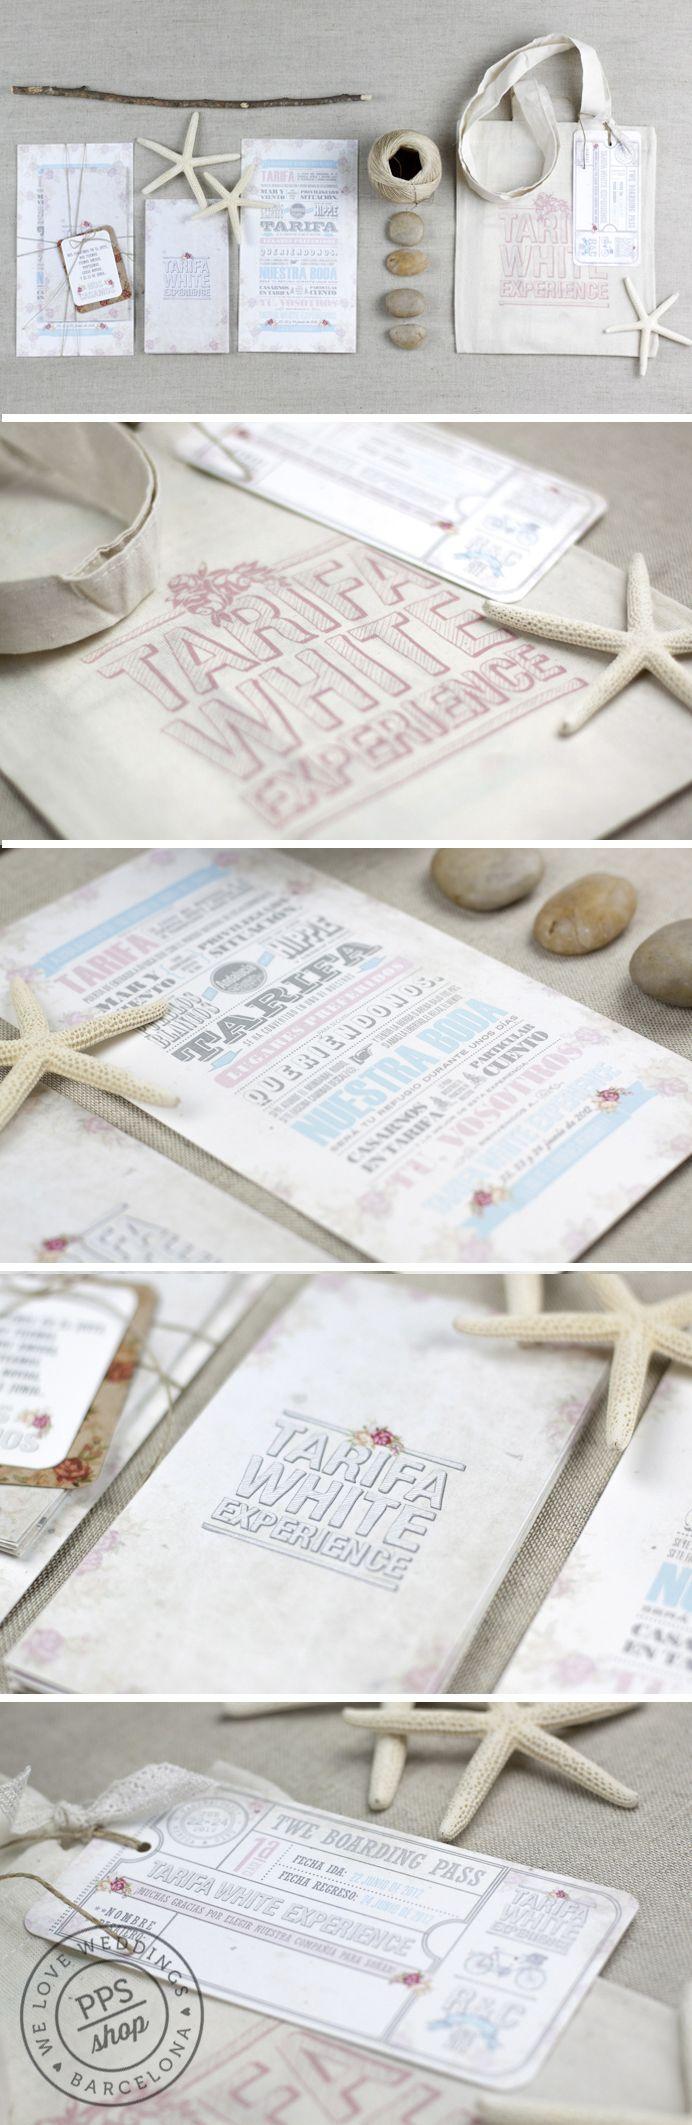 Boda personalizada PPStudio para Rebeca & César http://www.projectpartystudio.com/bodas-personalizadas-2/rebeca-cesar.html #boda #invitacion #wedding #stationery #ppstudio #handmade #stamp #sello #destinationswedding #beach #playa